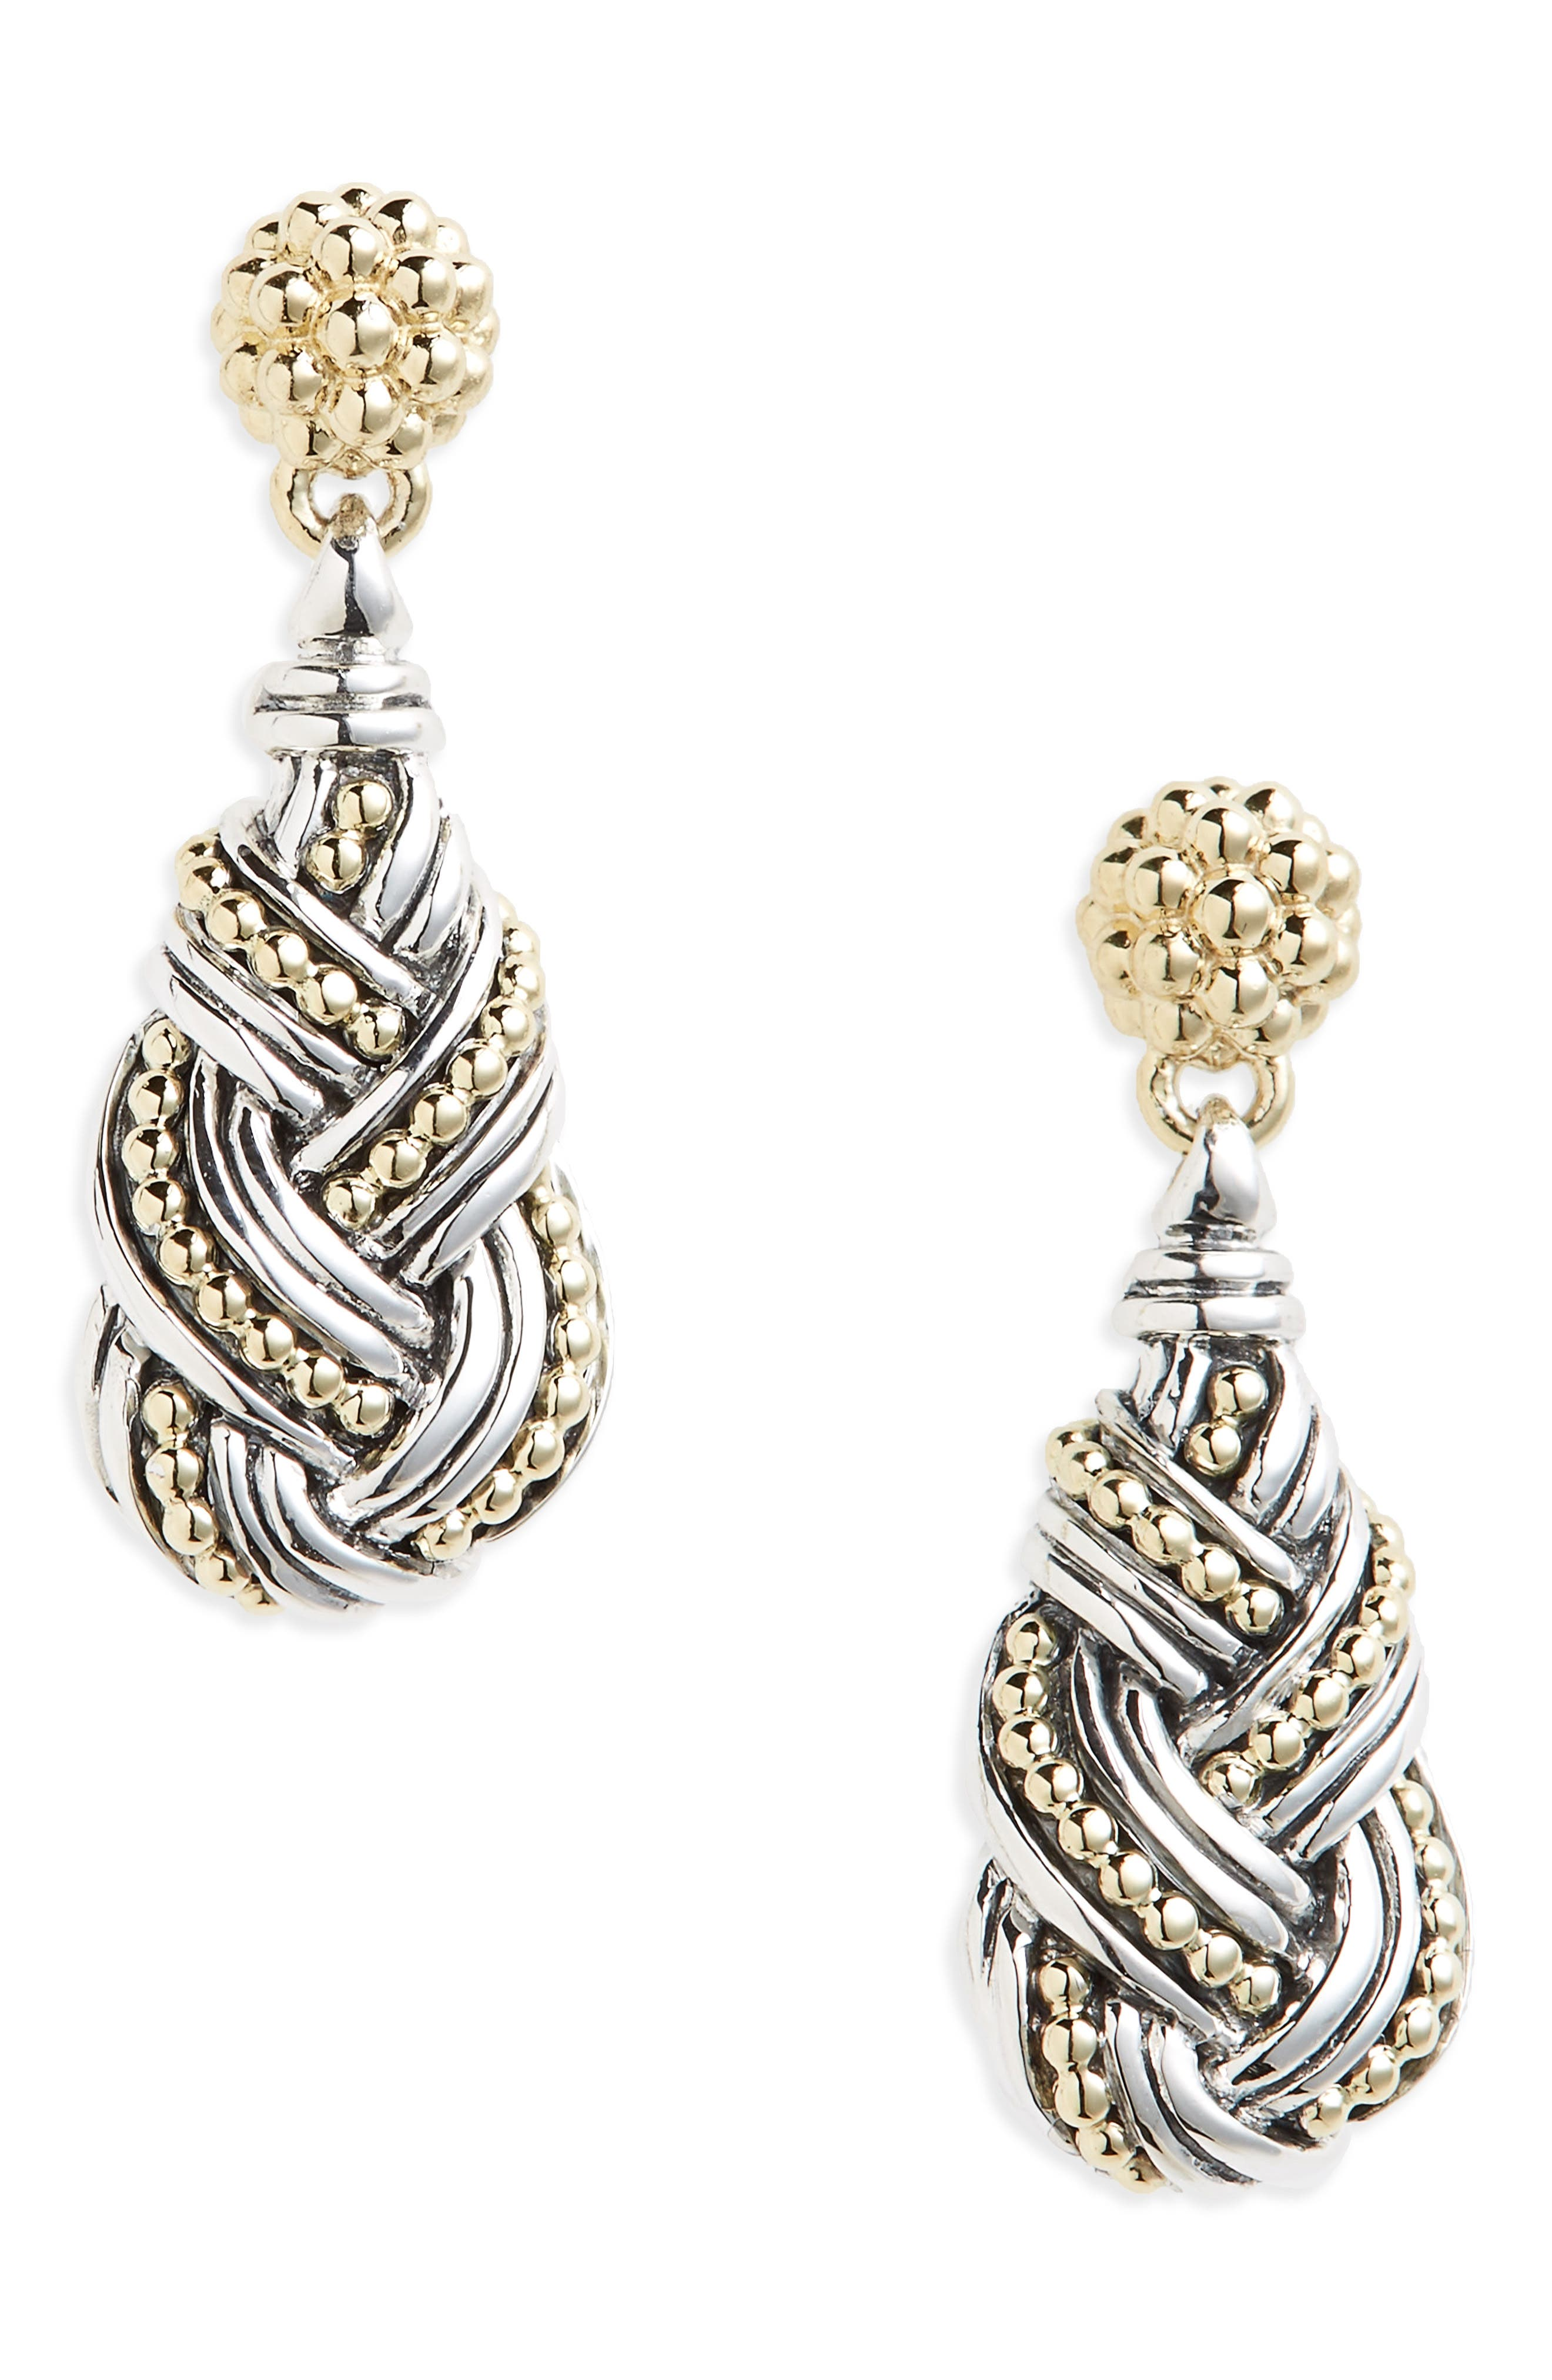 Torsade Drop Earrings,                         Main,                         color, SILVER/ GOLD